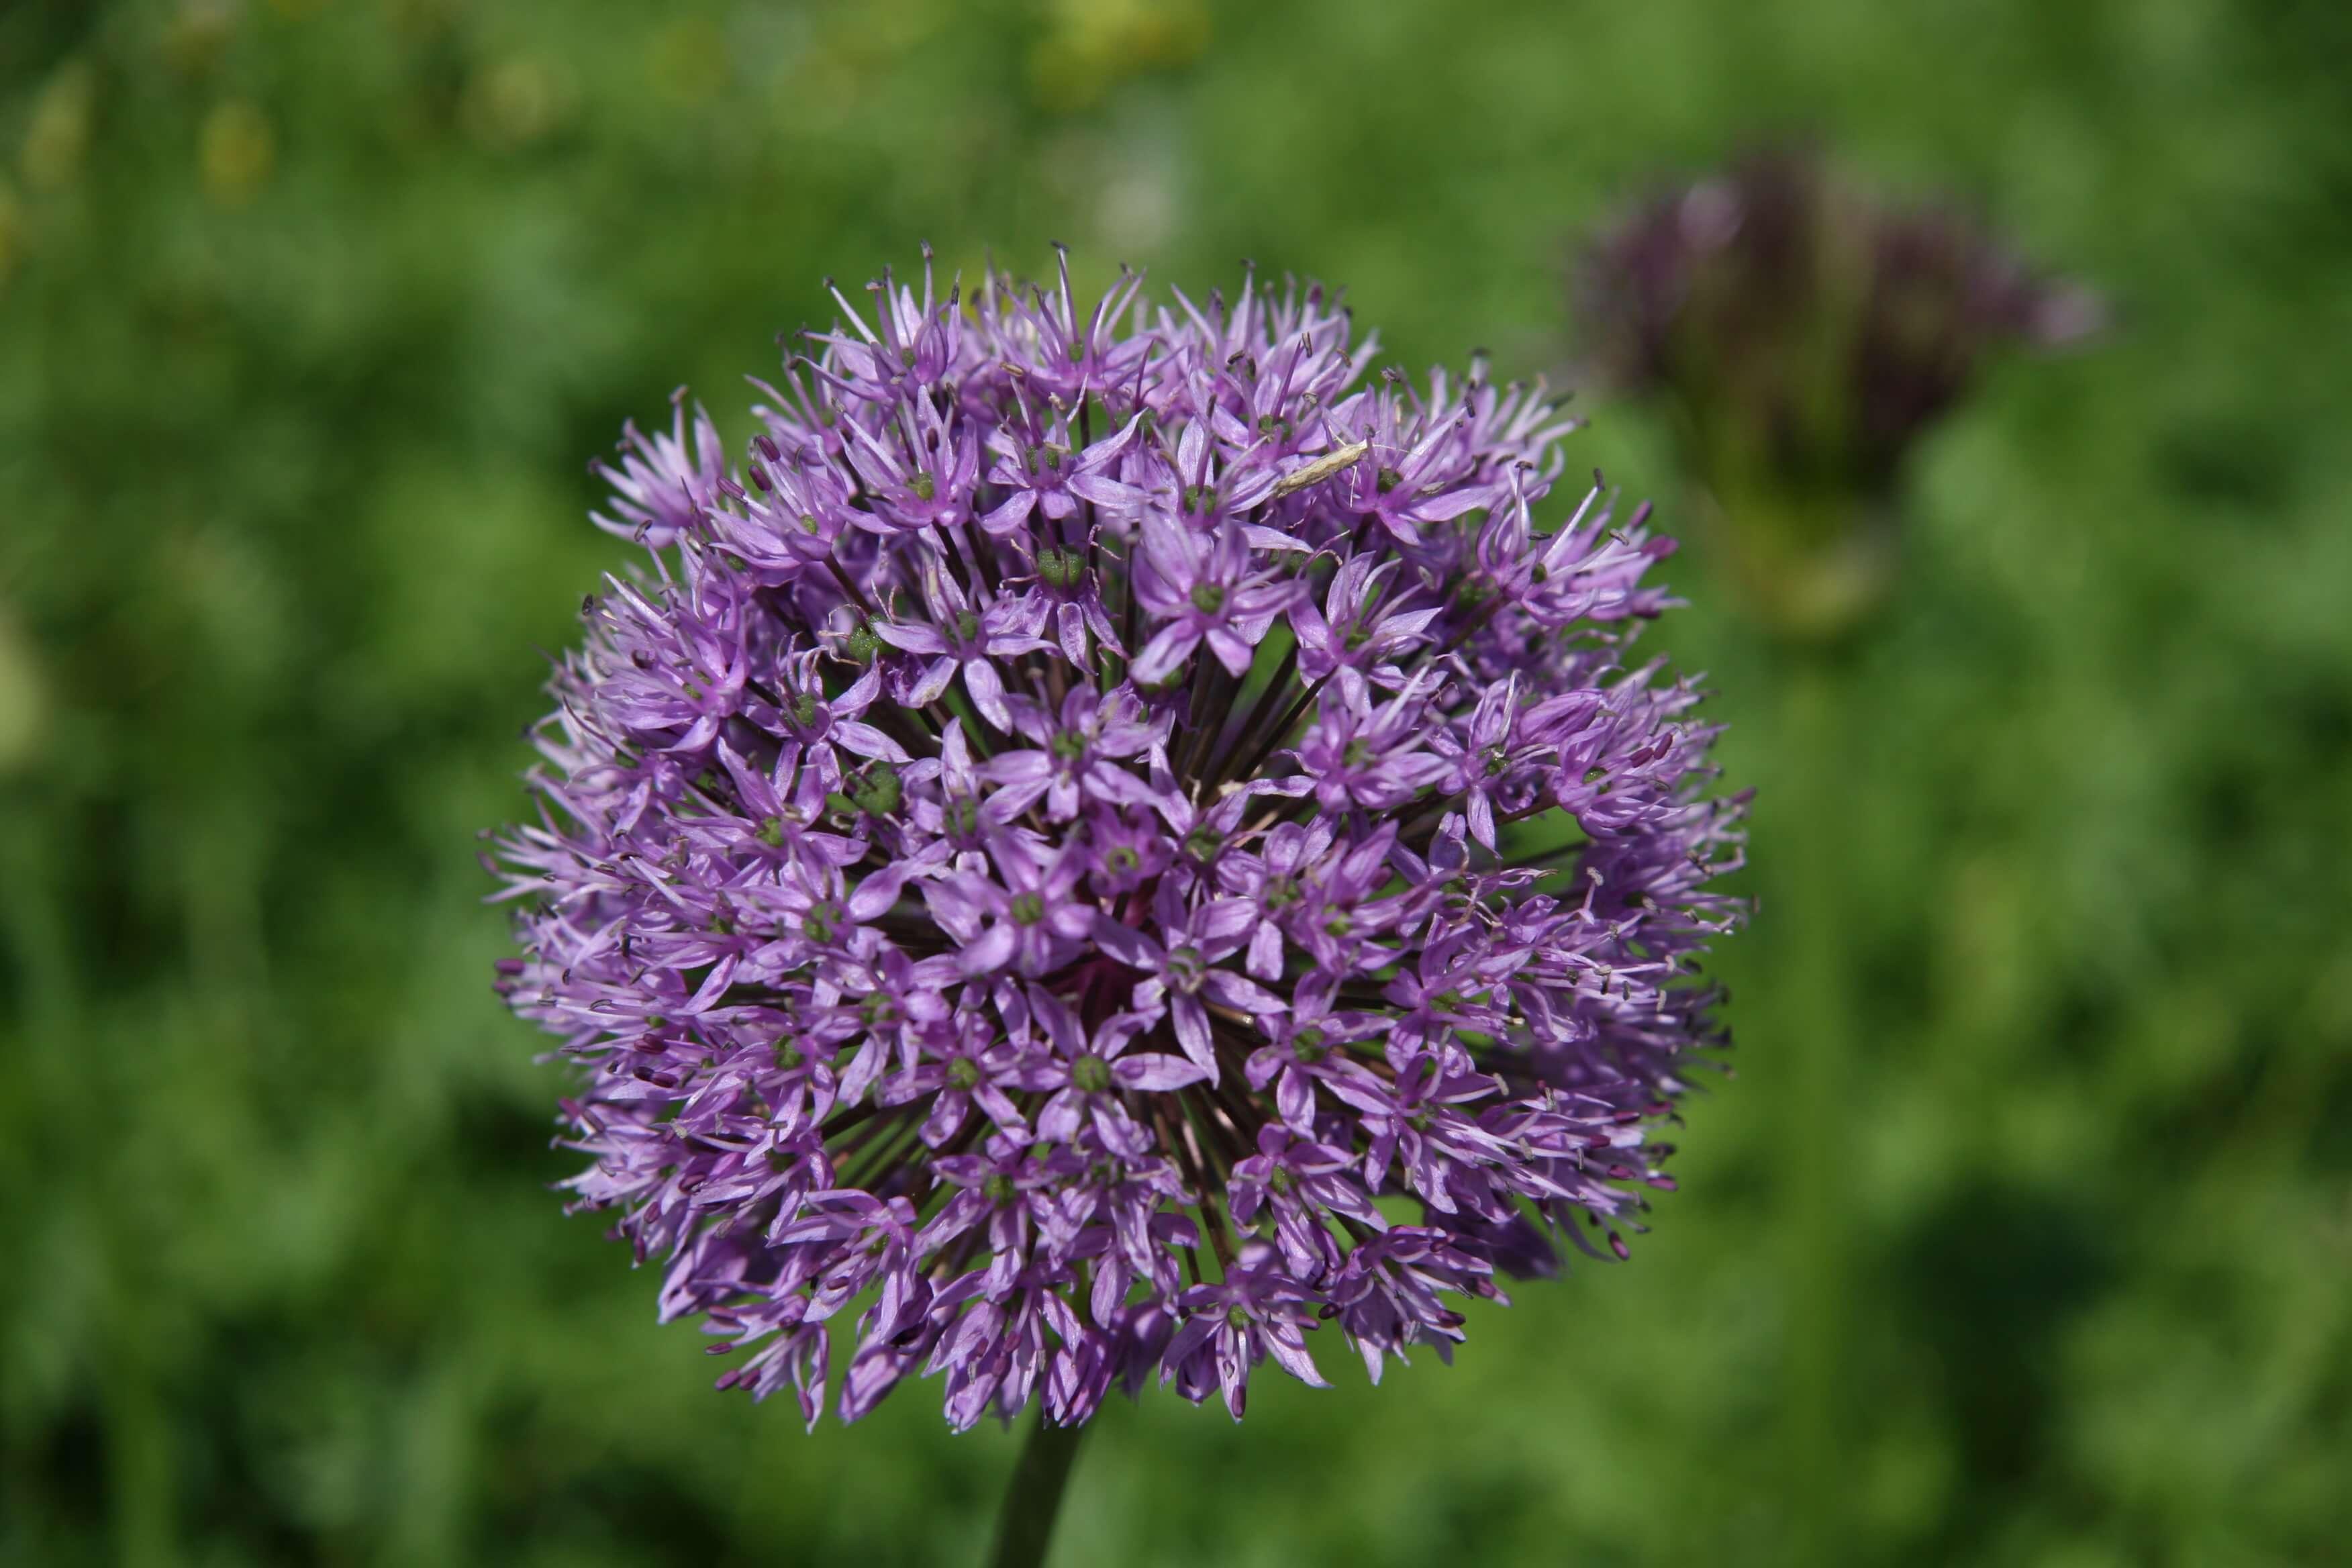 Agapanthus flower in The Nurture Project garden